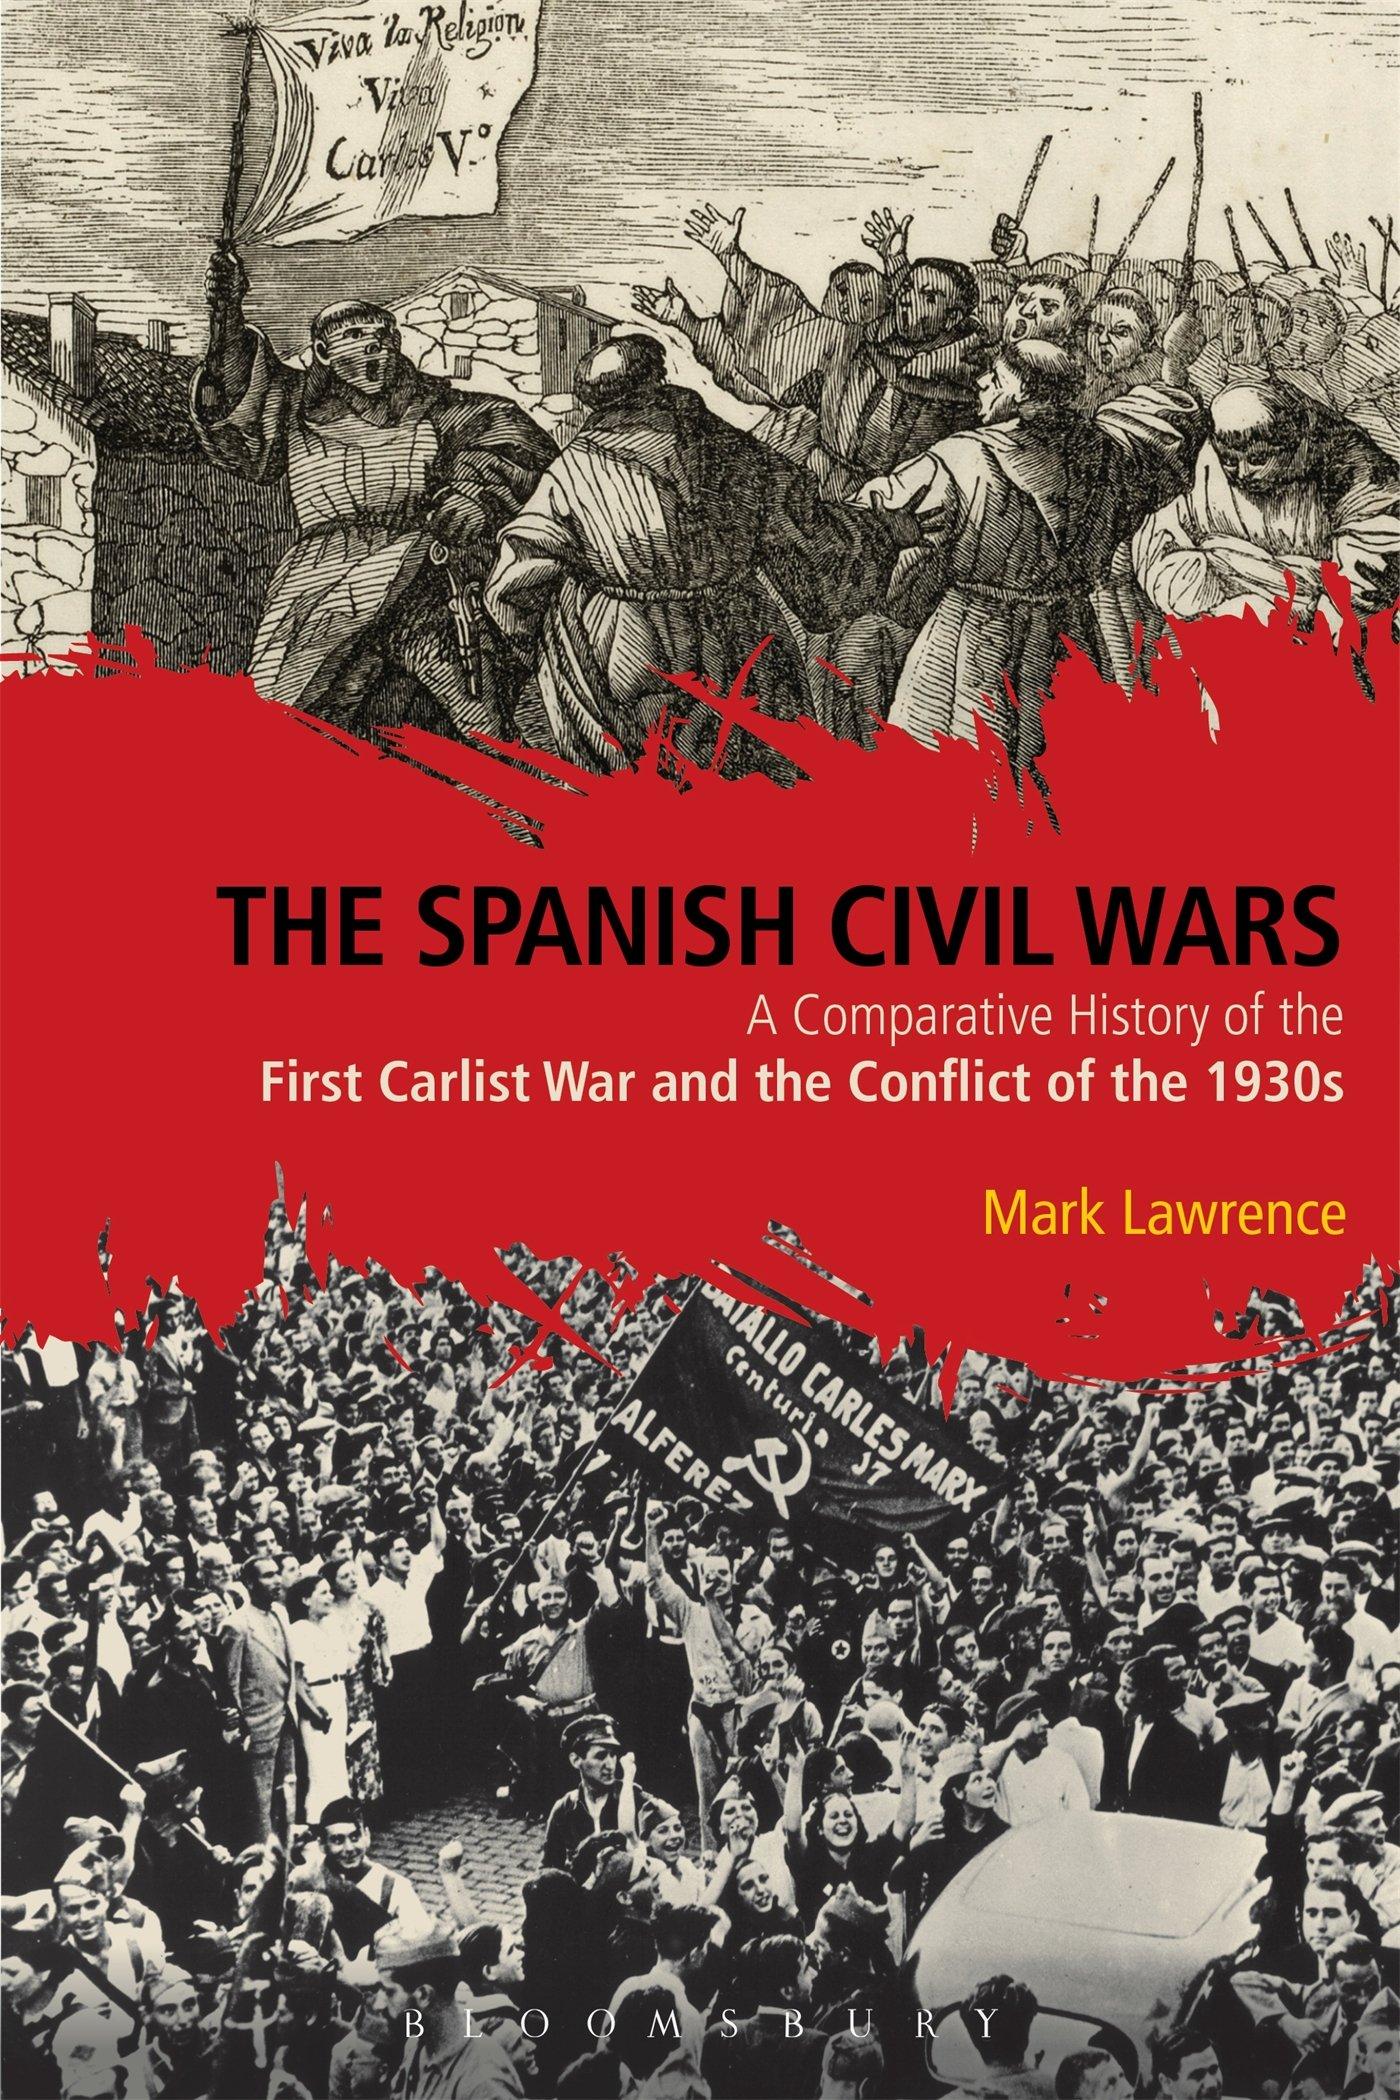 The Spanish Civil Wars